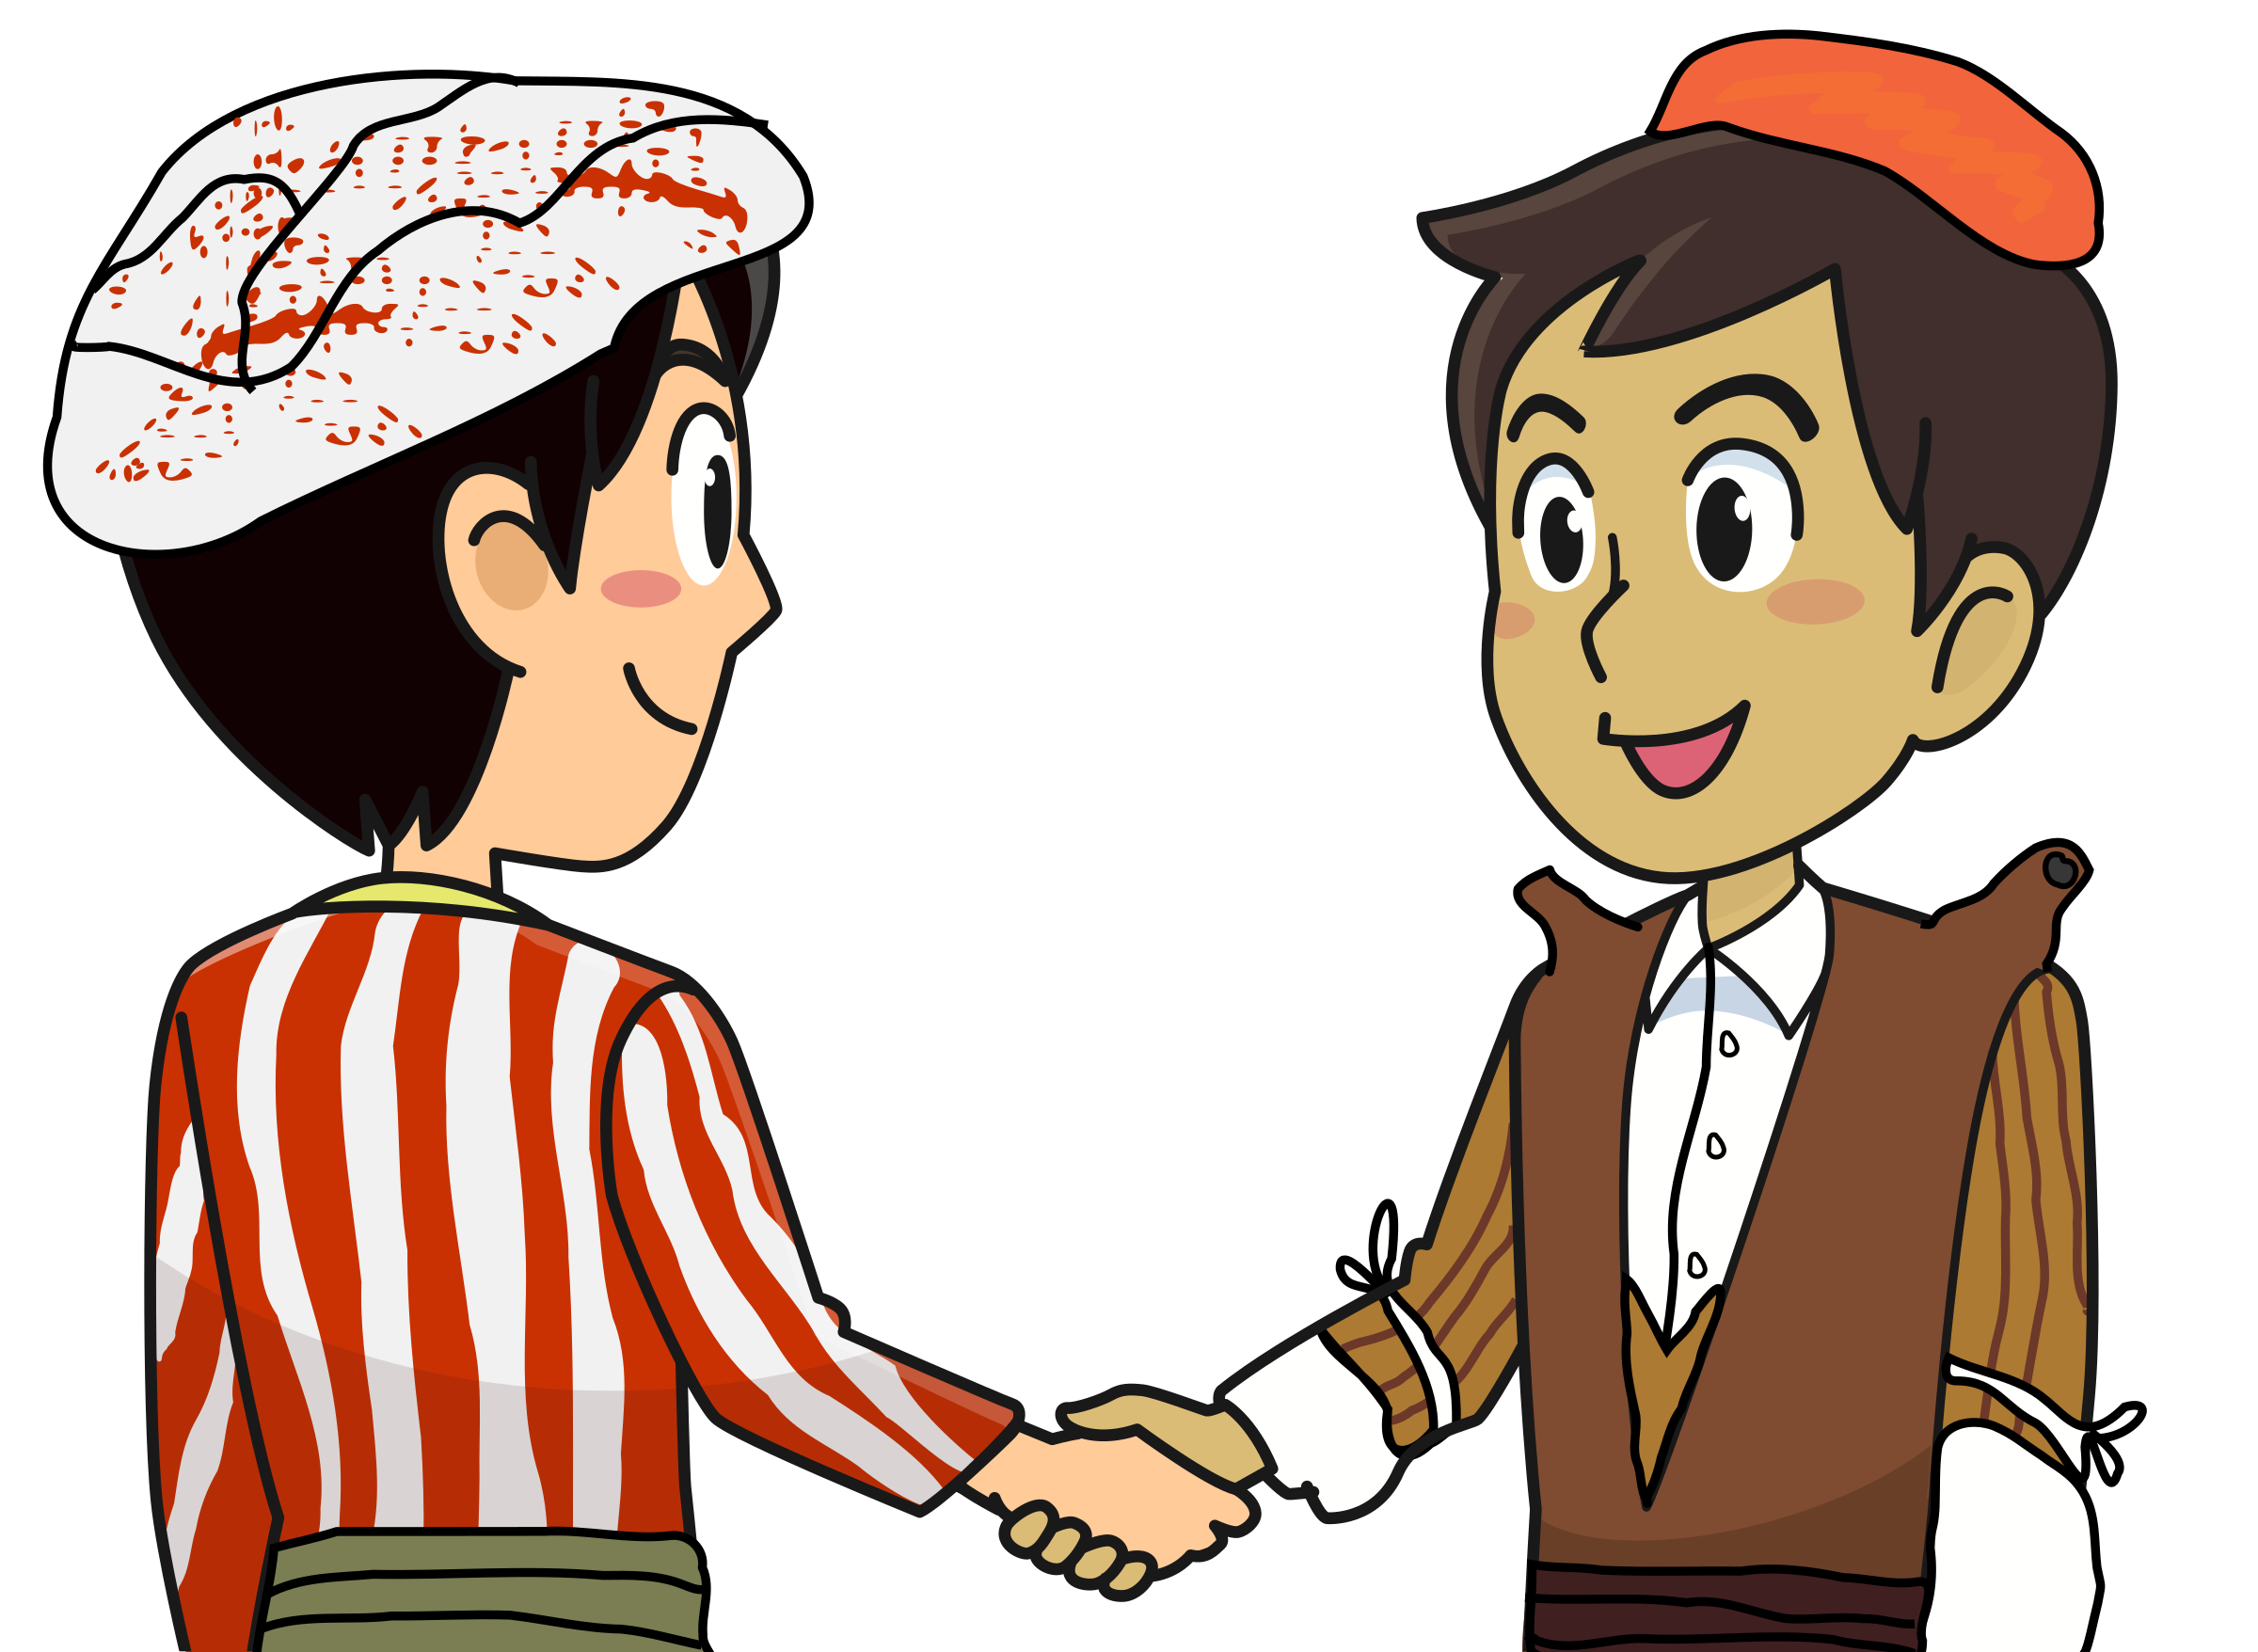 Kurdish big image png. Handshake clipart animated